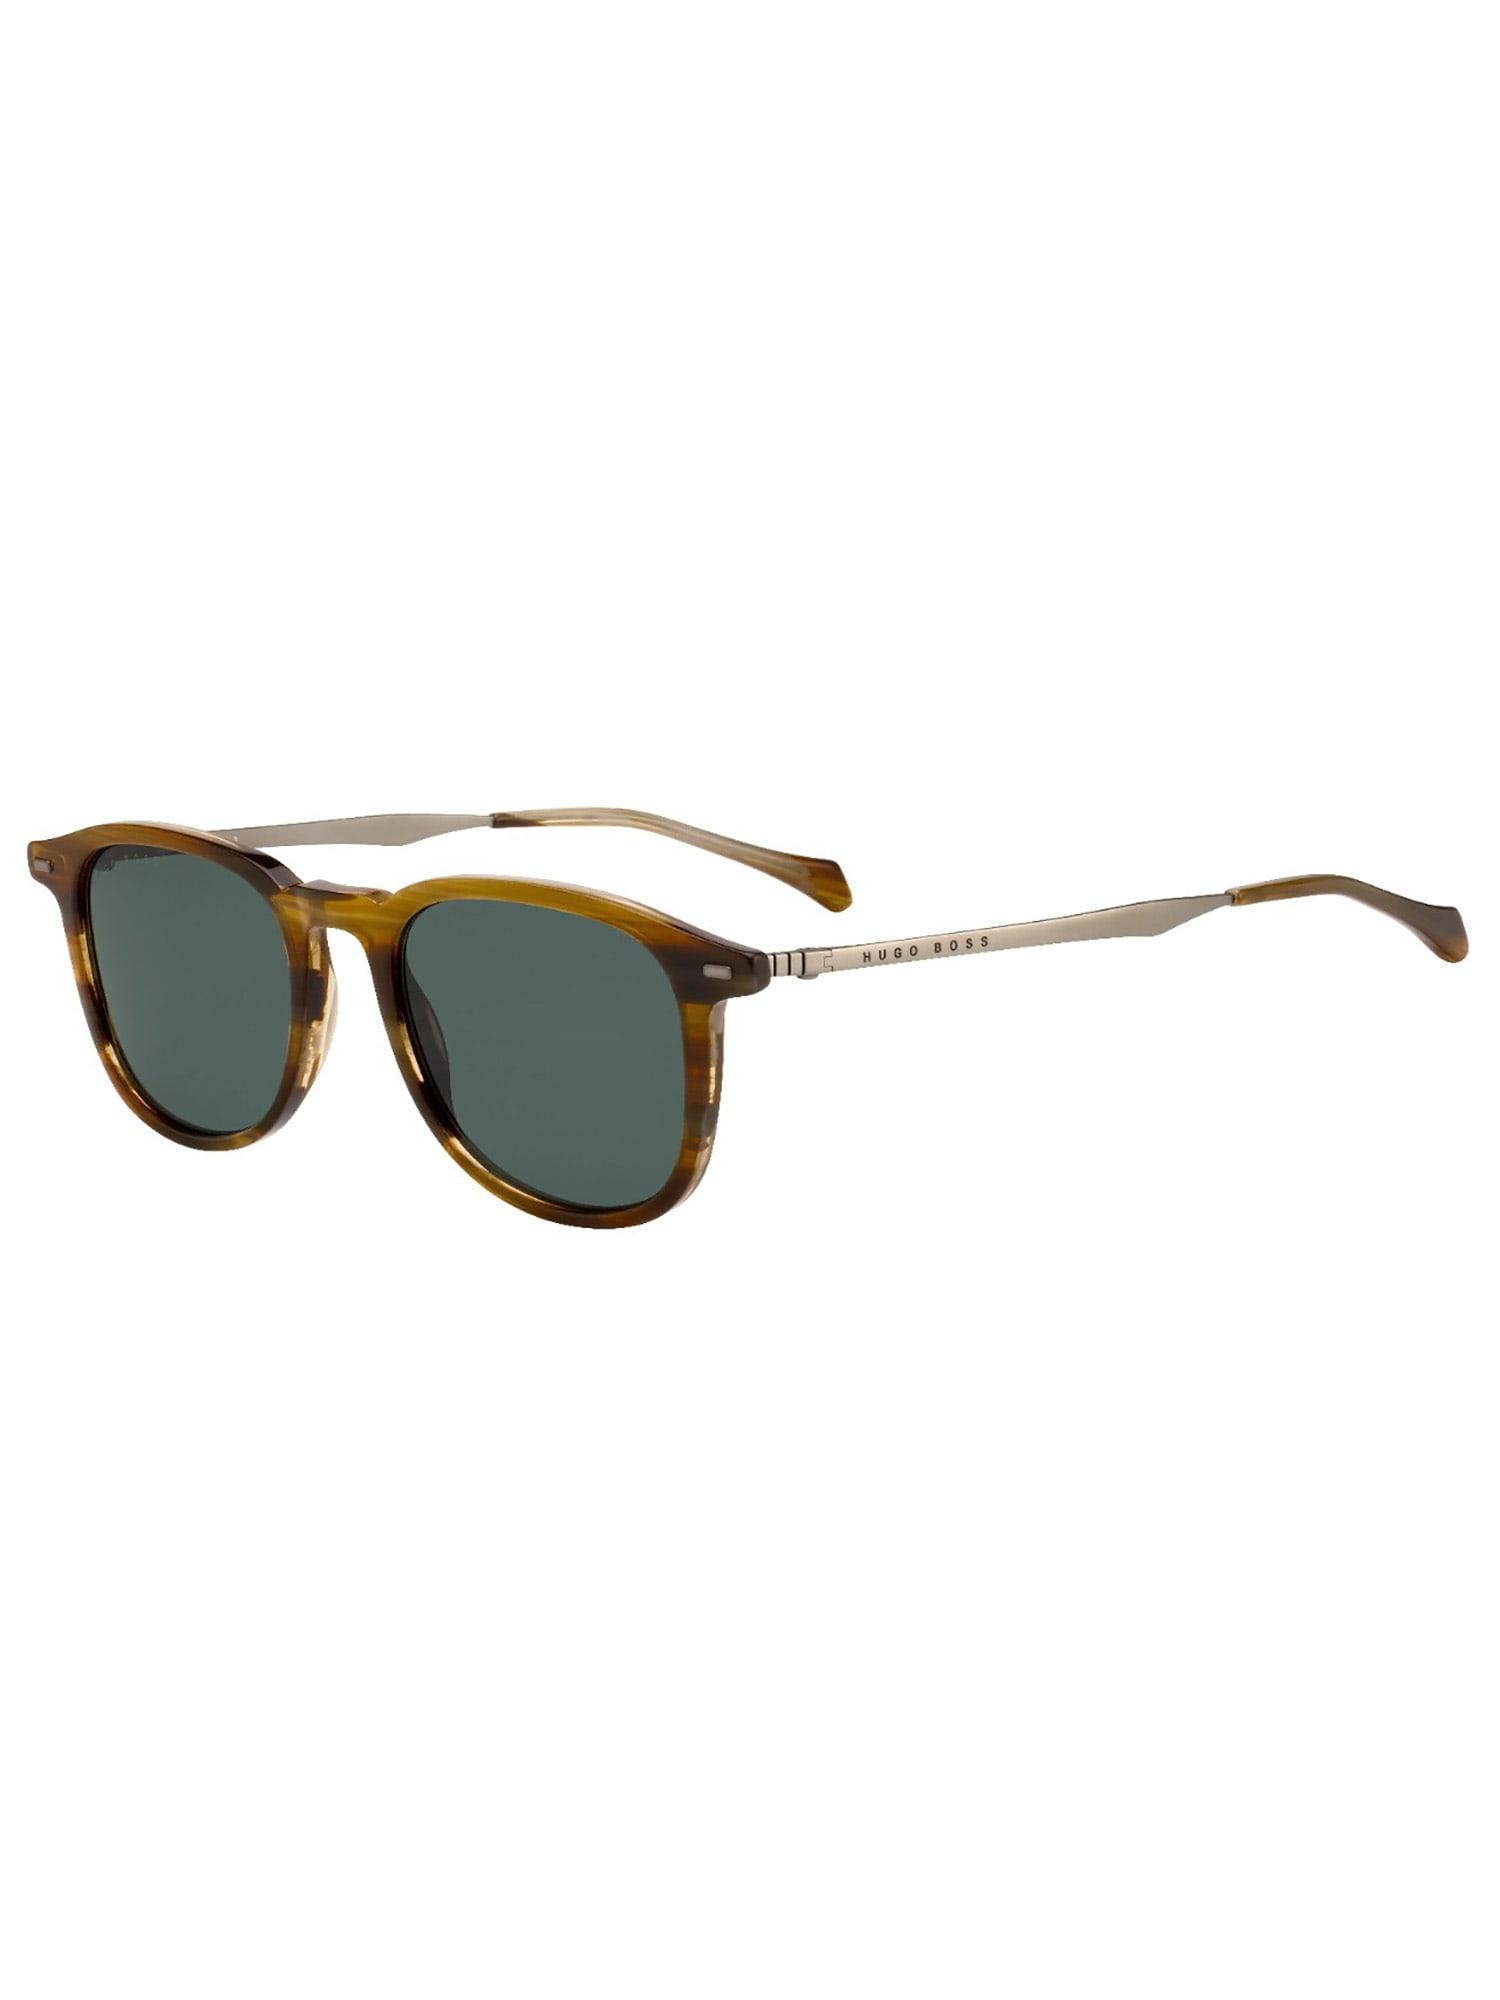 Hugo Boss BOSS 1094/S Sunglasses